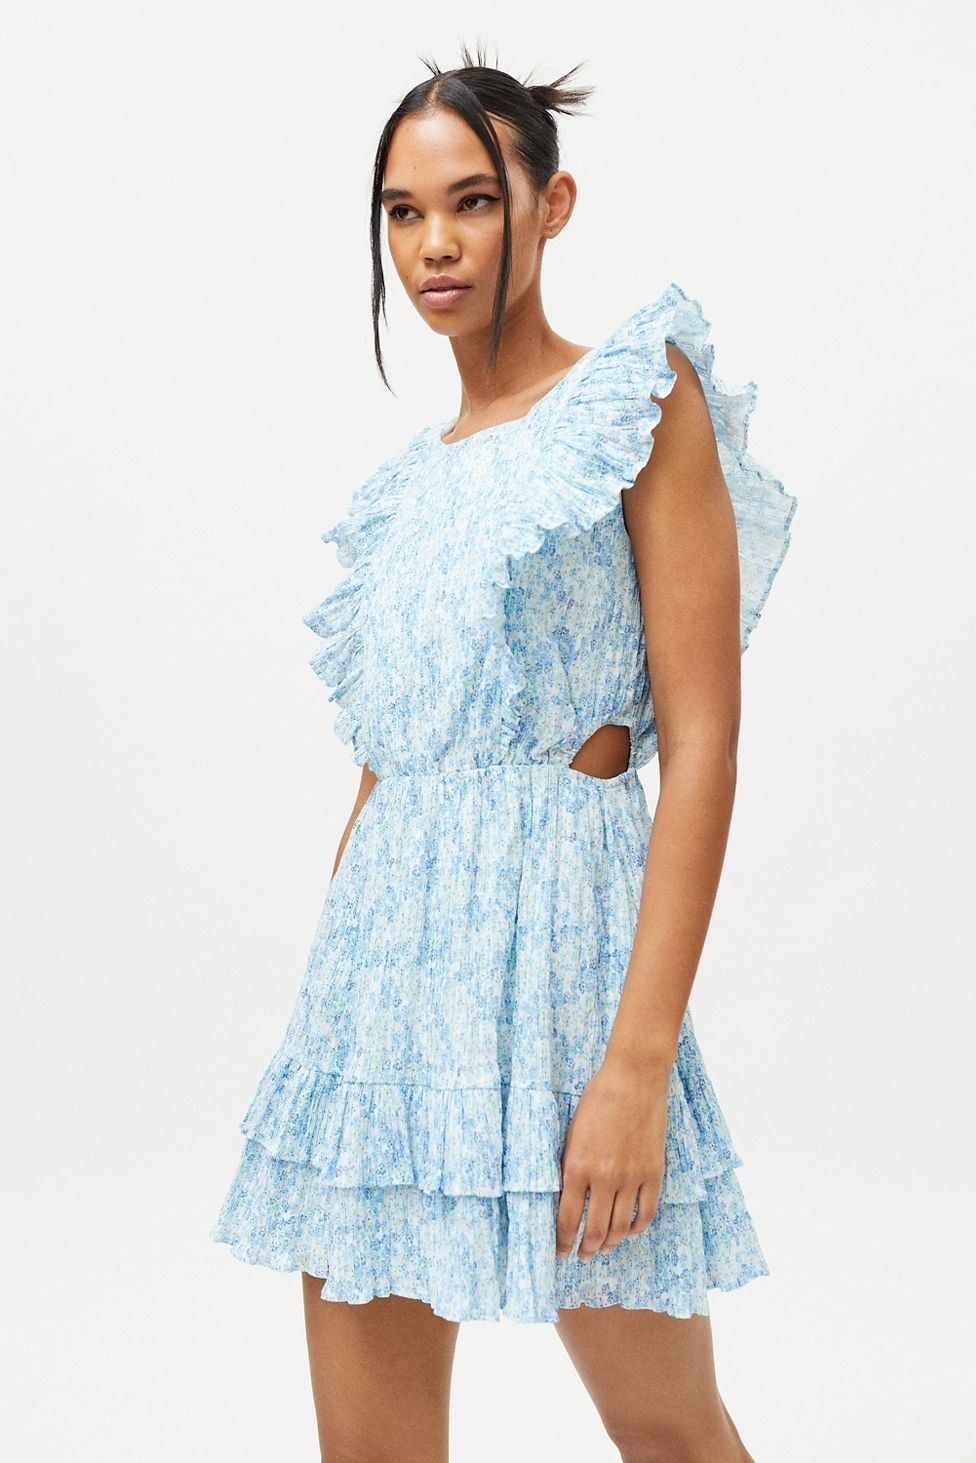 a model wearing the blue floral MINKPINK Zahari ruffle sleeve mini dress